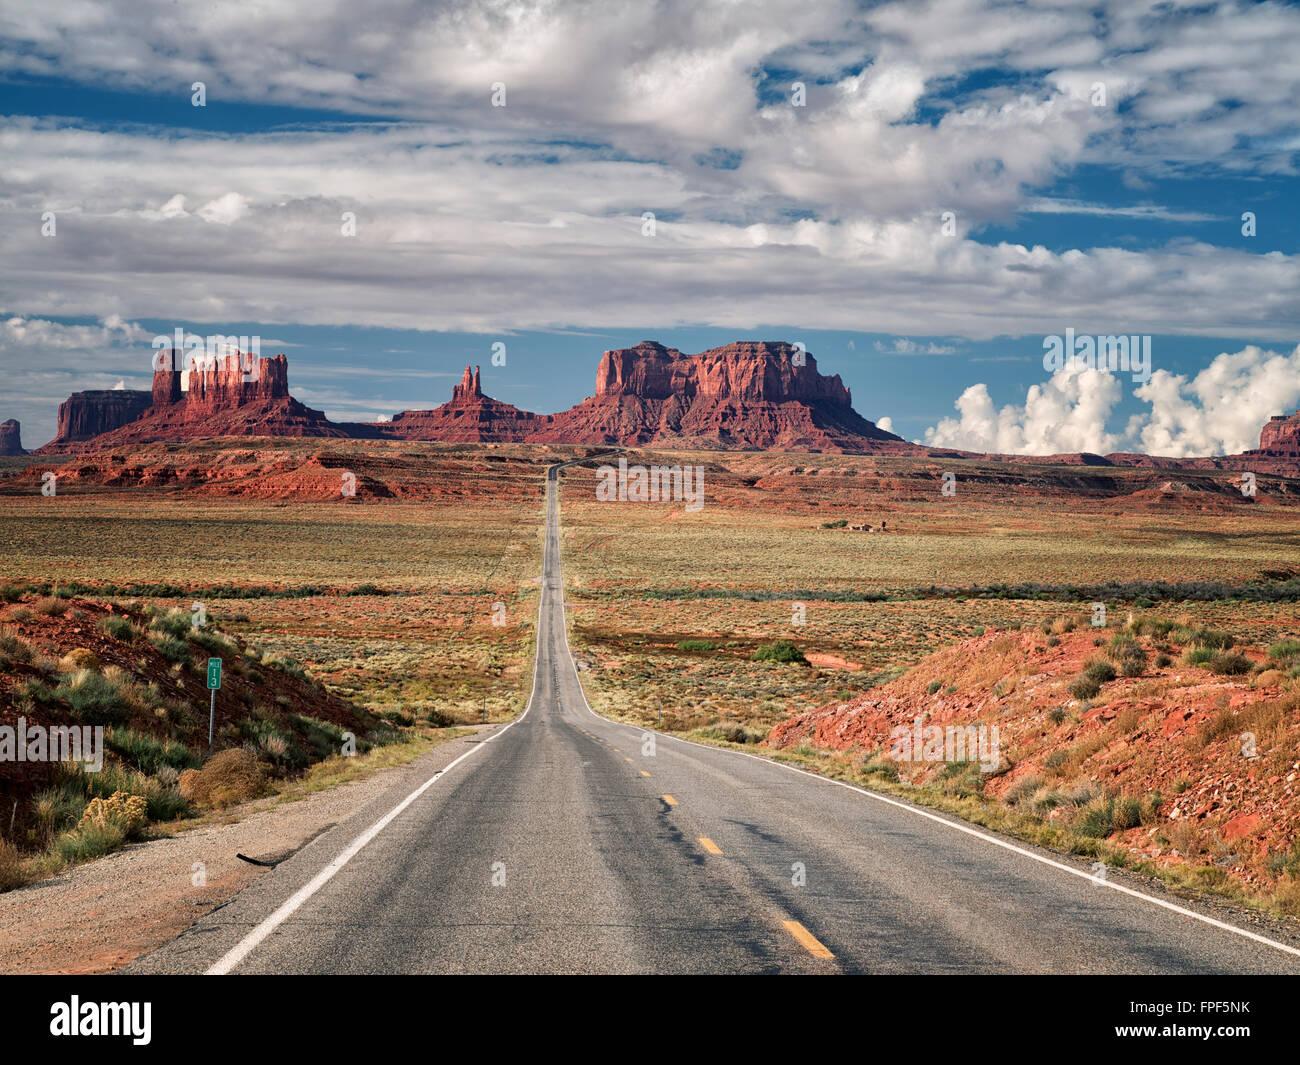 L'autoroute menant à Monument Valley. Utah/Arizona Photo Stock